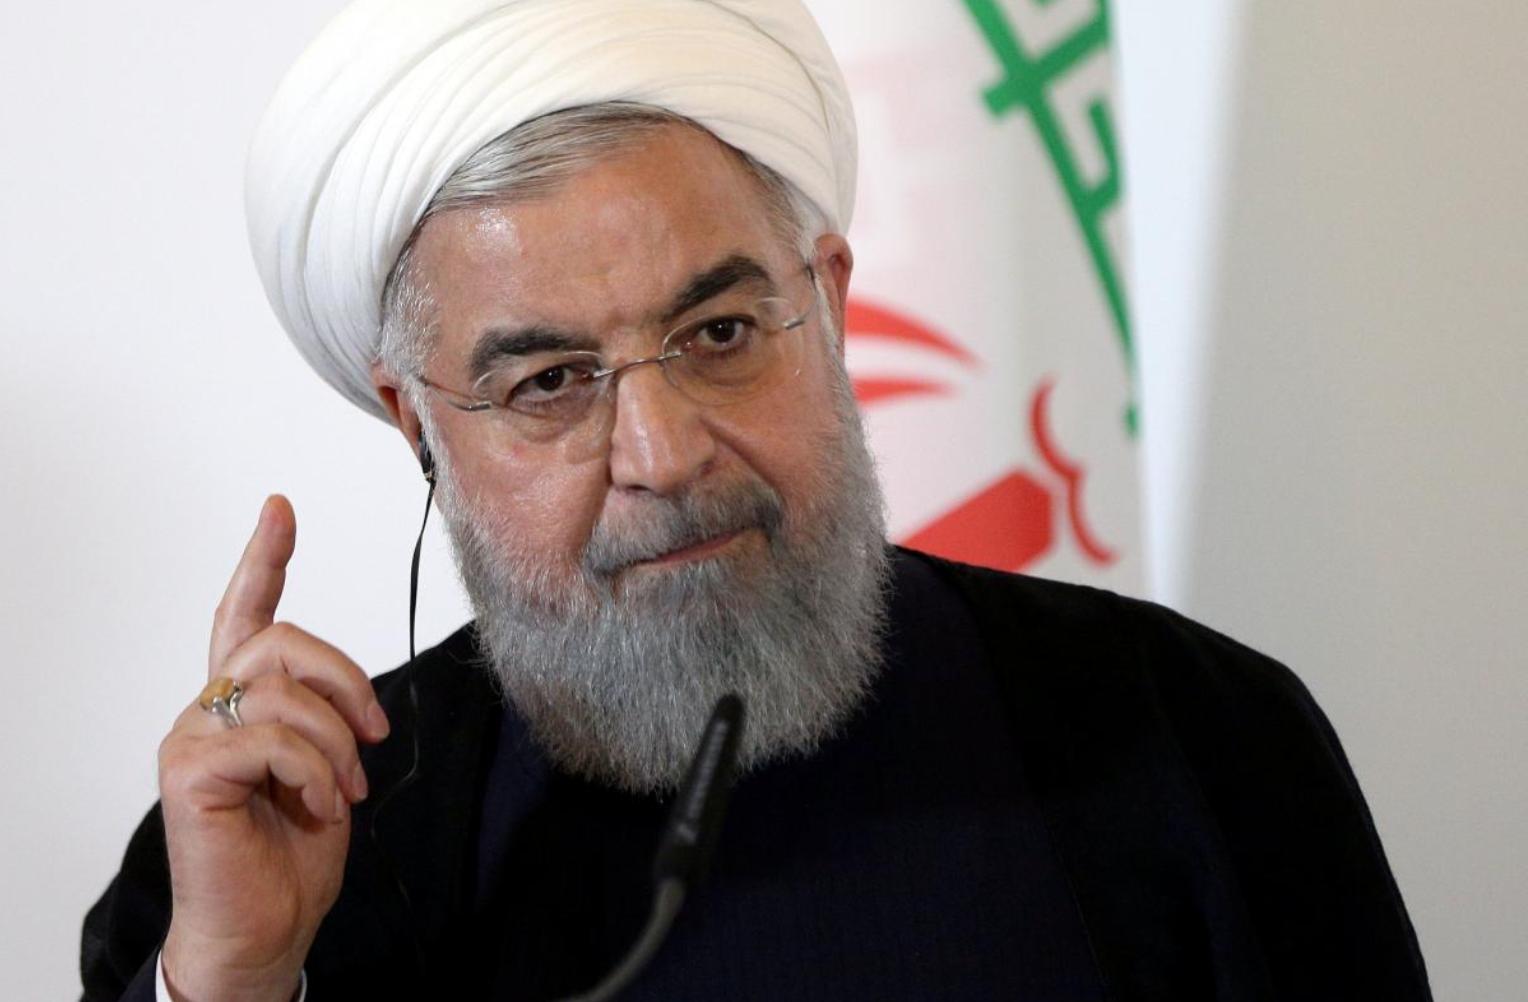 Iran's Rouhani says US sanctions are 'terrorist act'